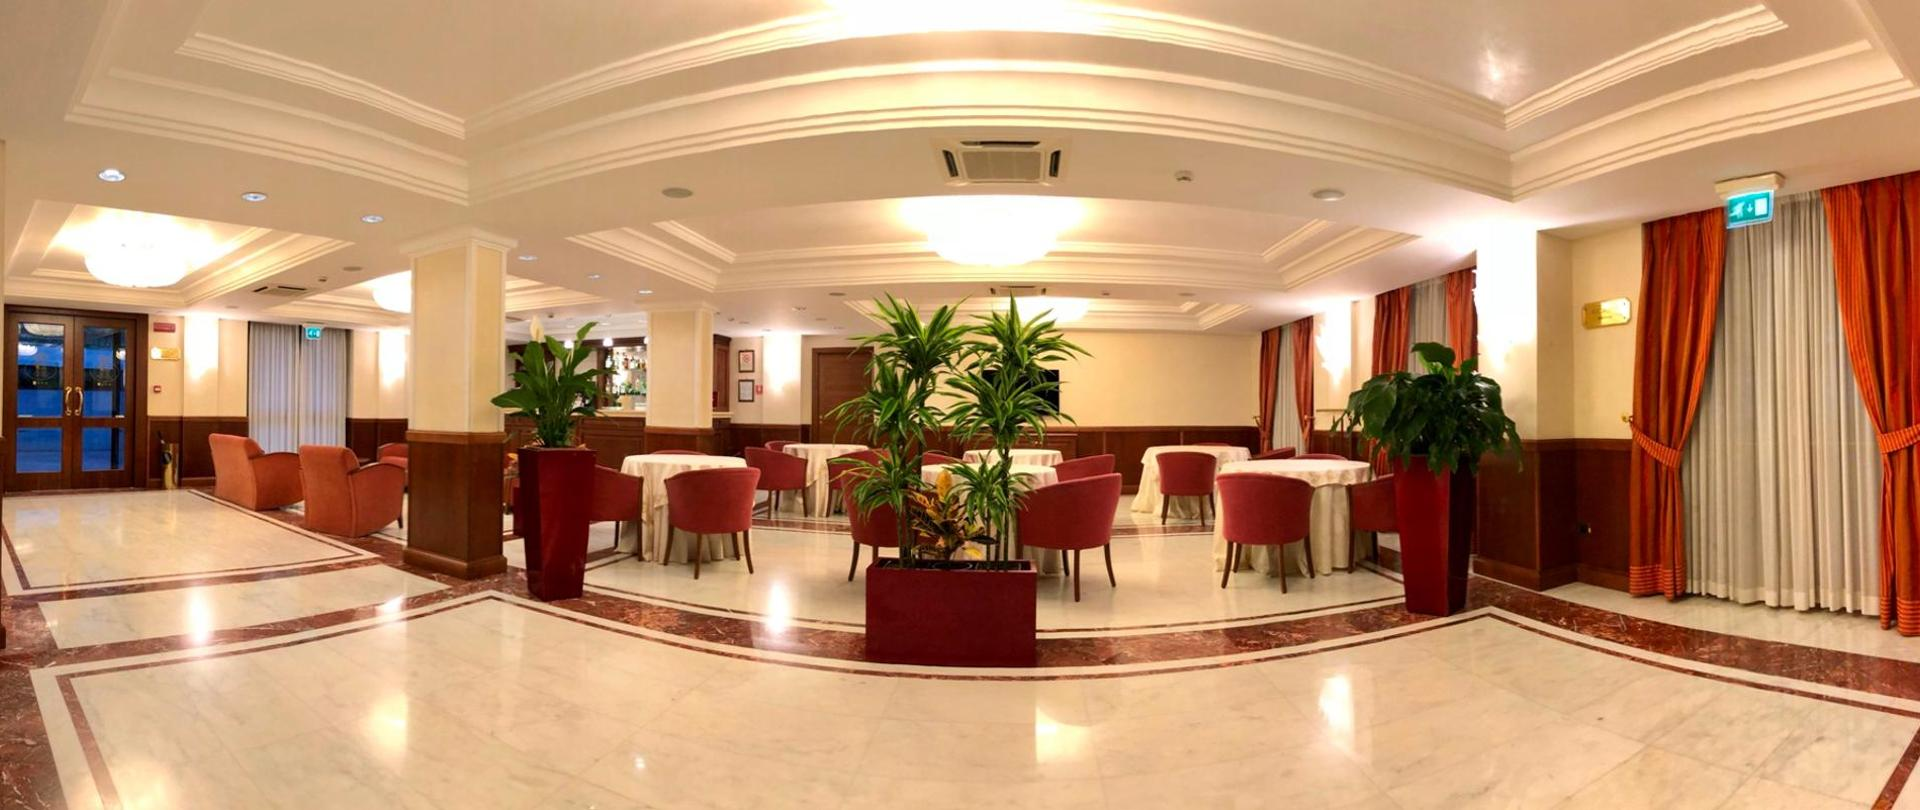 Hall-Hôtel San-Giovanni-Rotondo.jpg